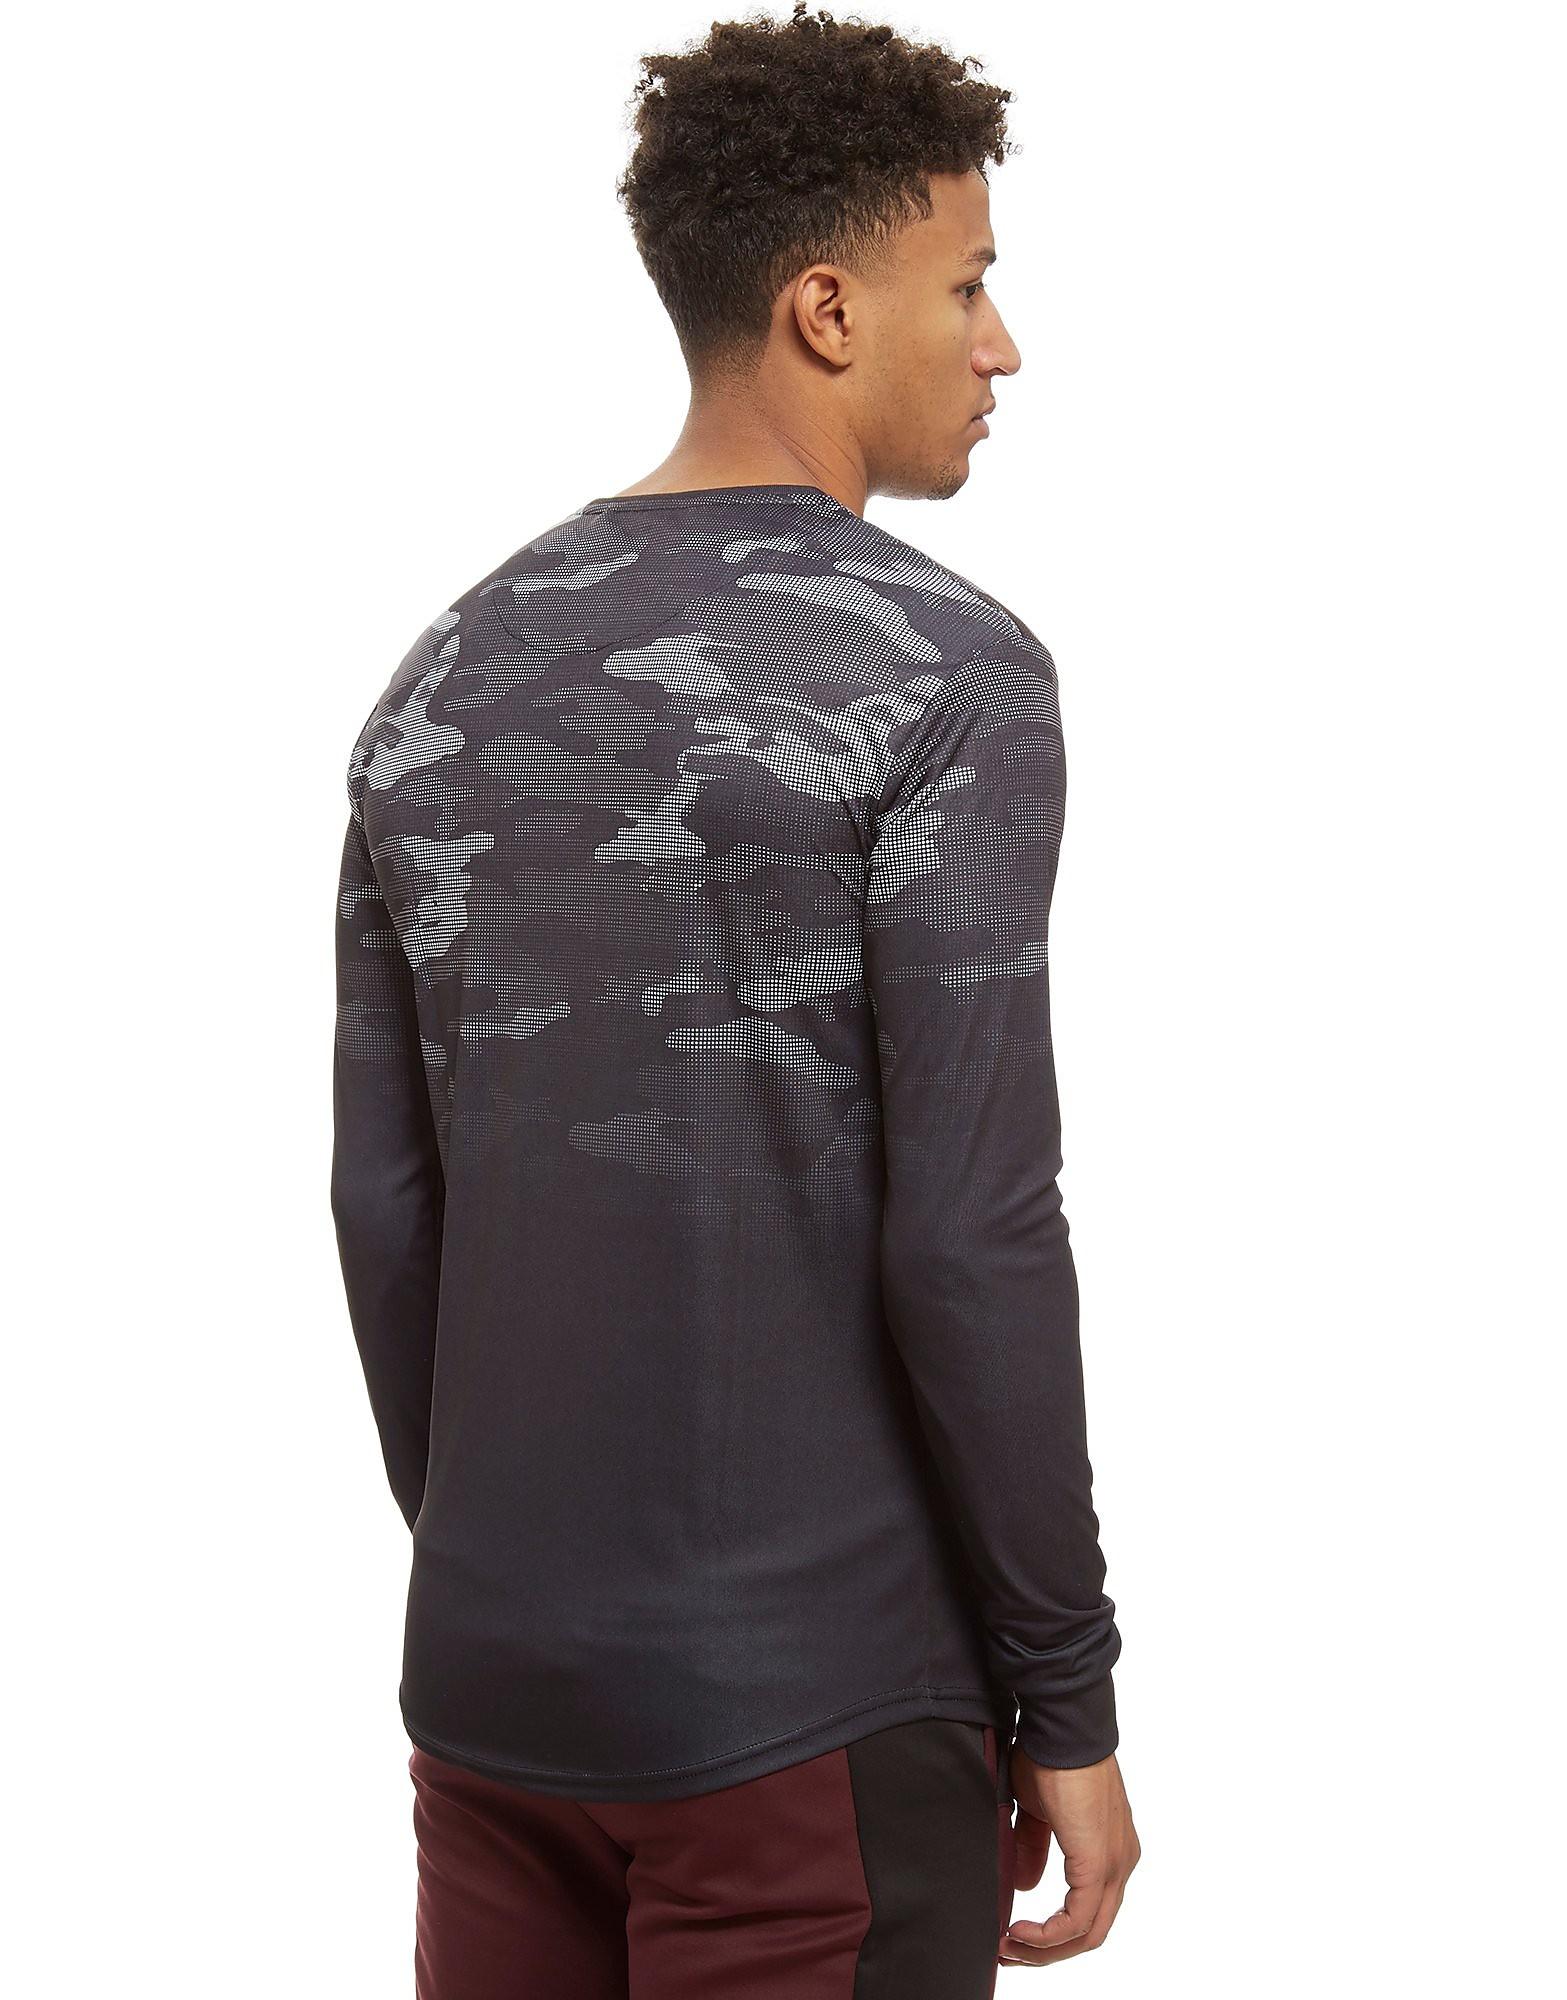 Sonneti Kam Long Sleeve T-Shirt